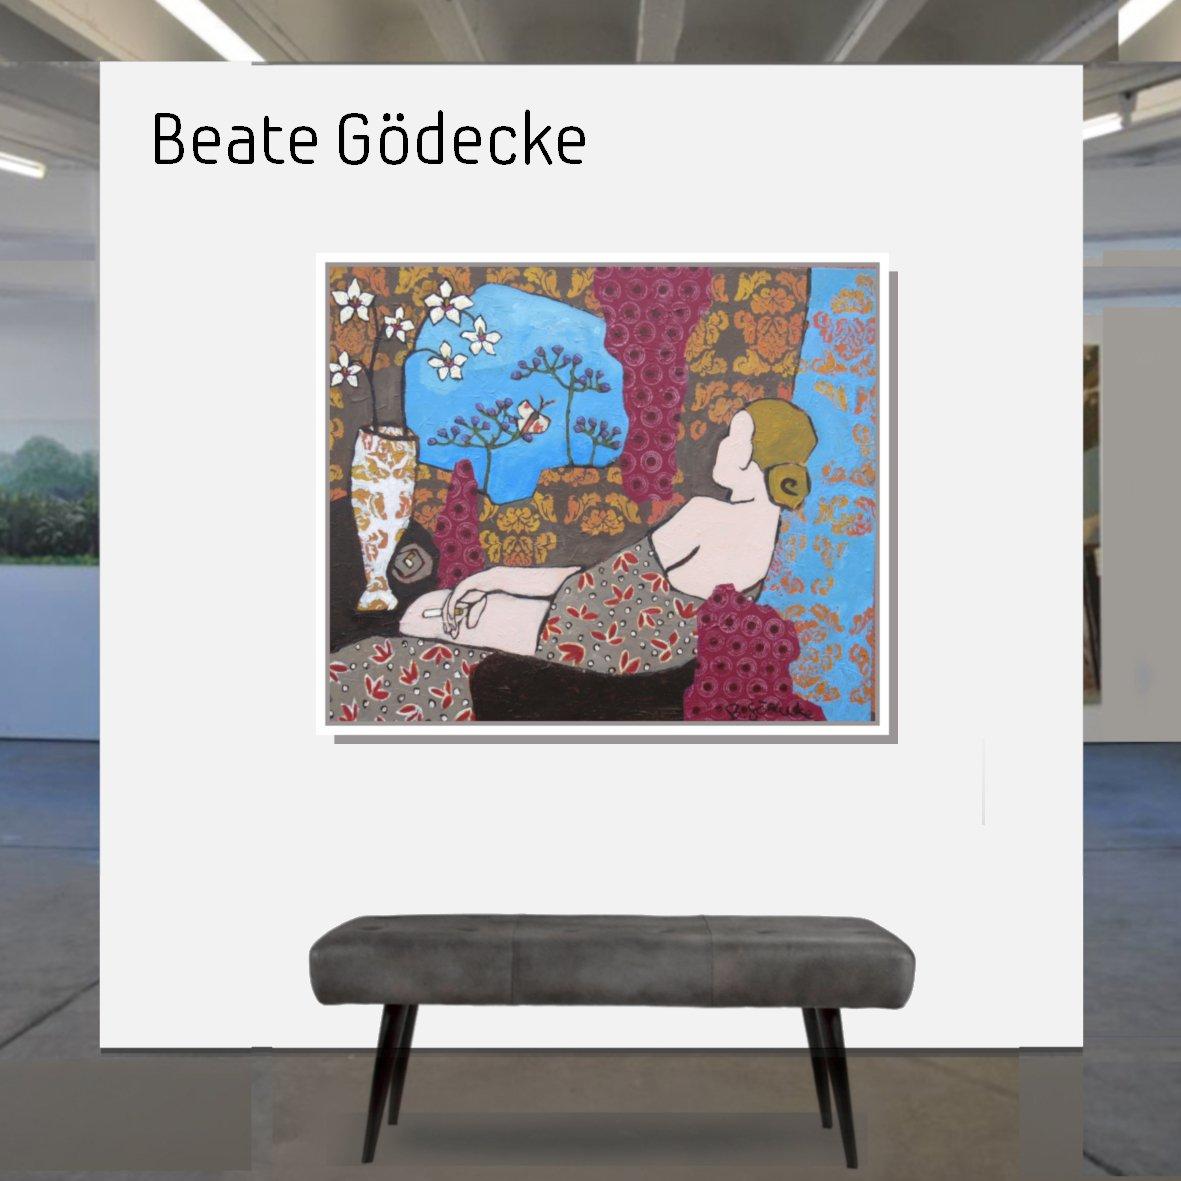 Maske_Gödecke_Beate_100x120Tagtraum_mit_Rahmen